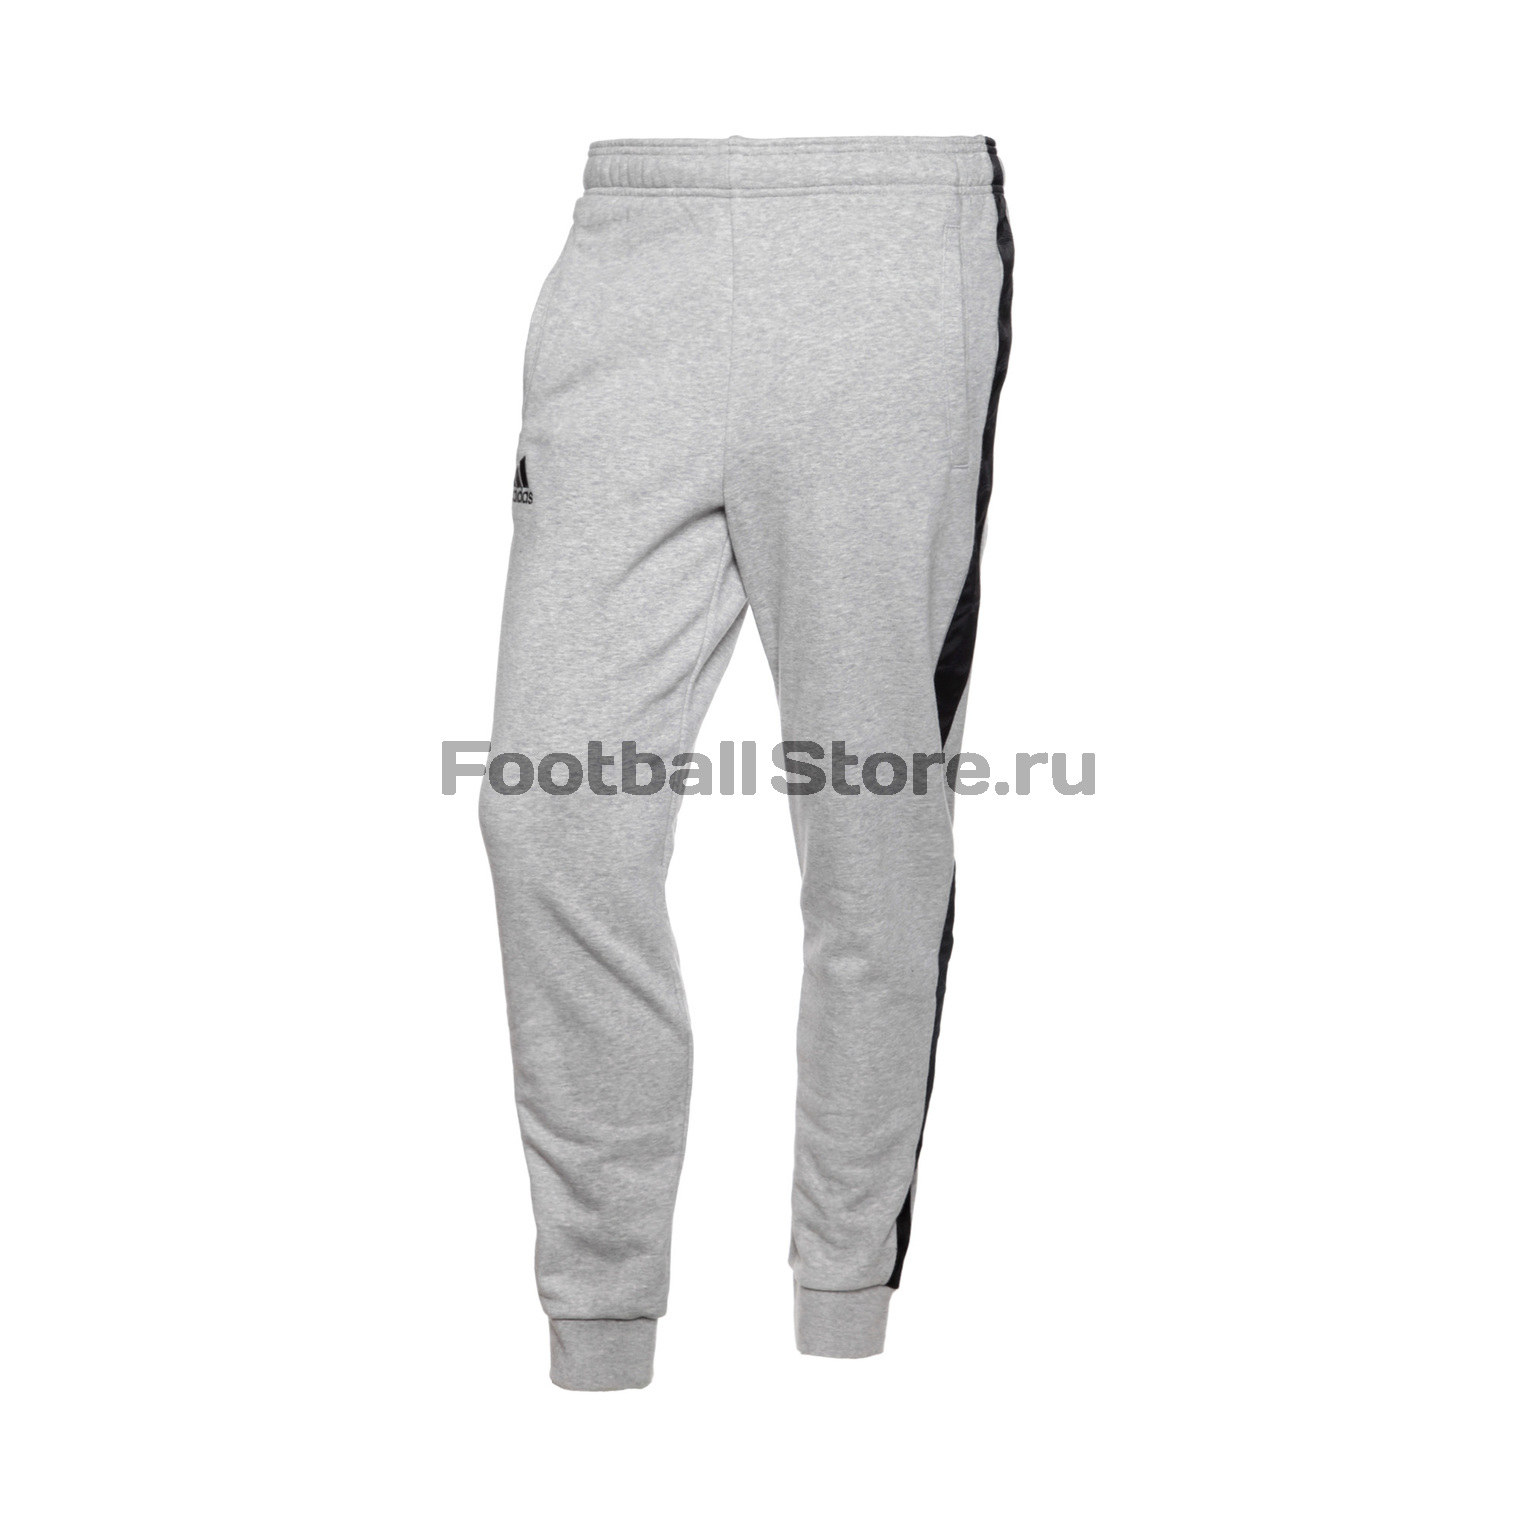 Брюки Adidas Tan SWT Joggers CD7116 цена